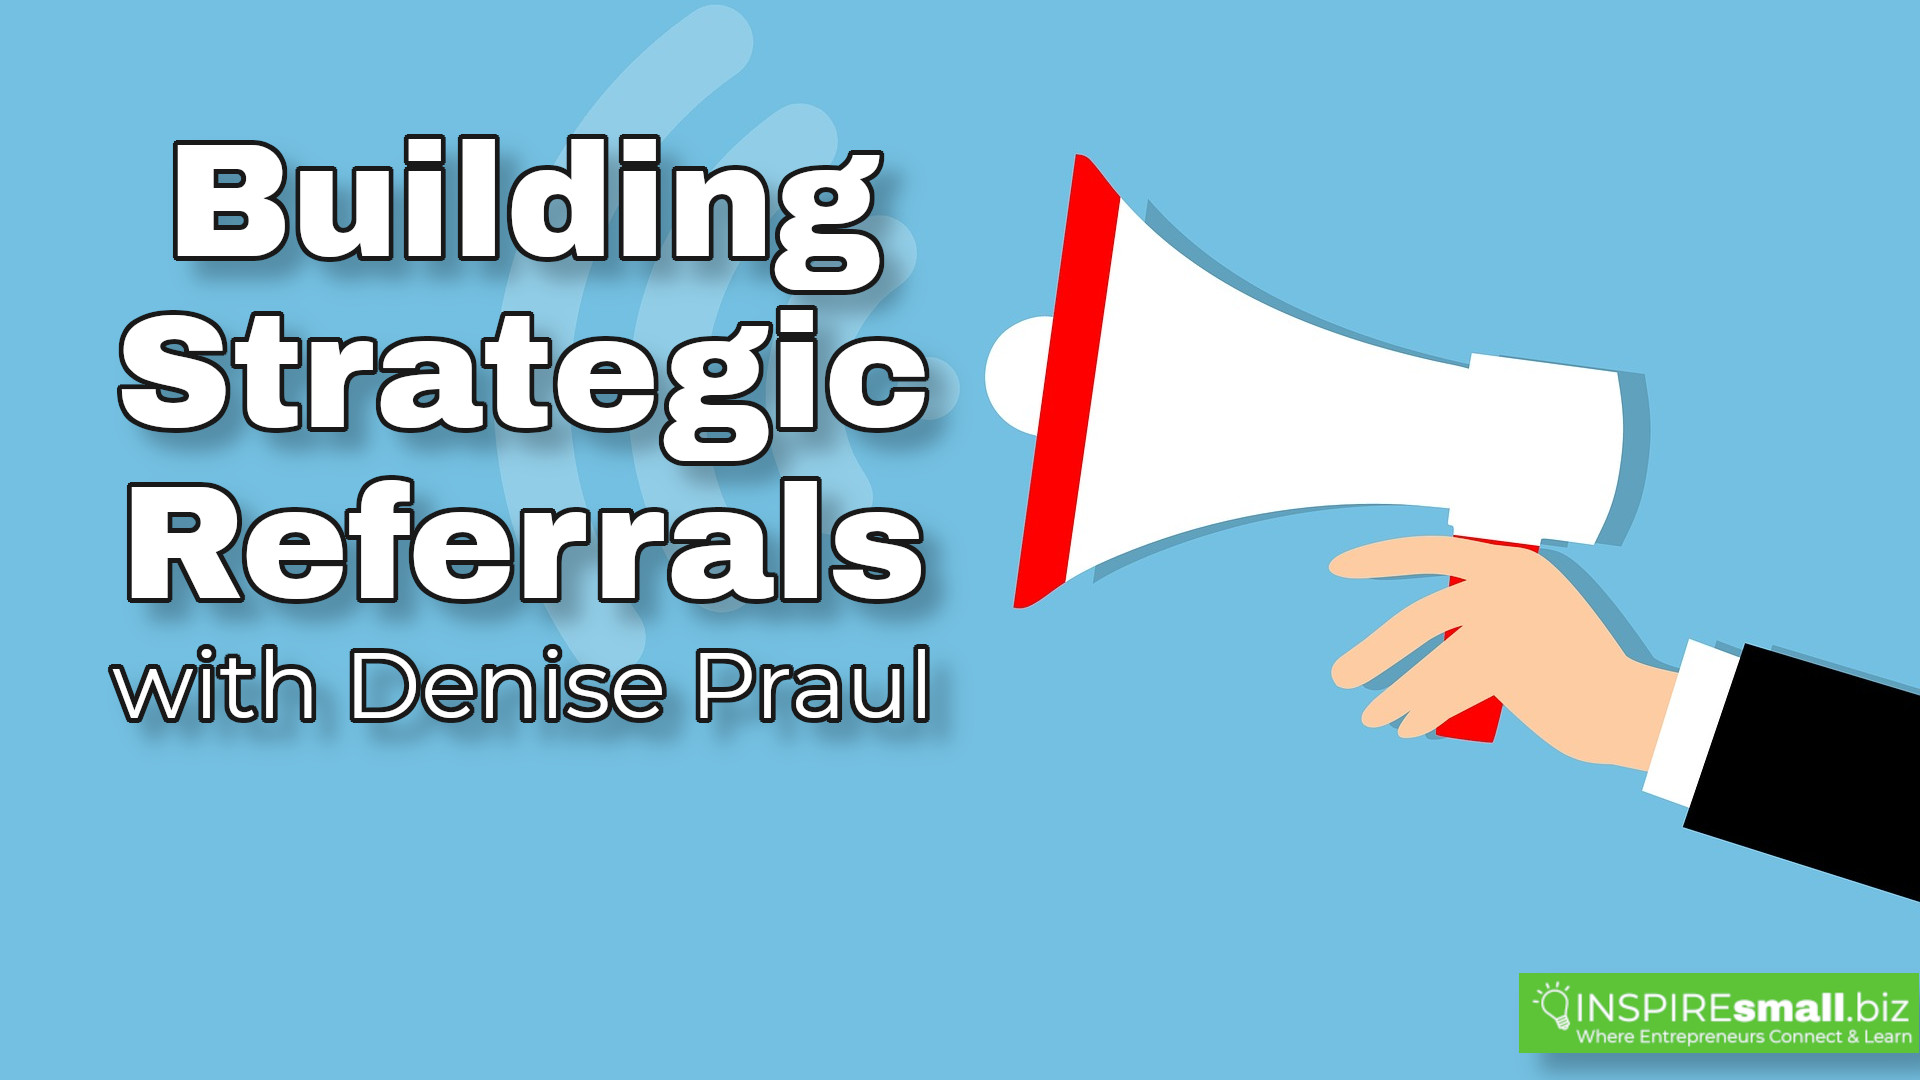 Building Strategic Referrals with Denise Praul